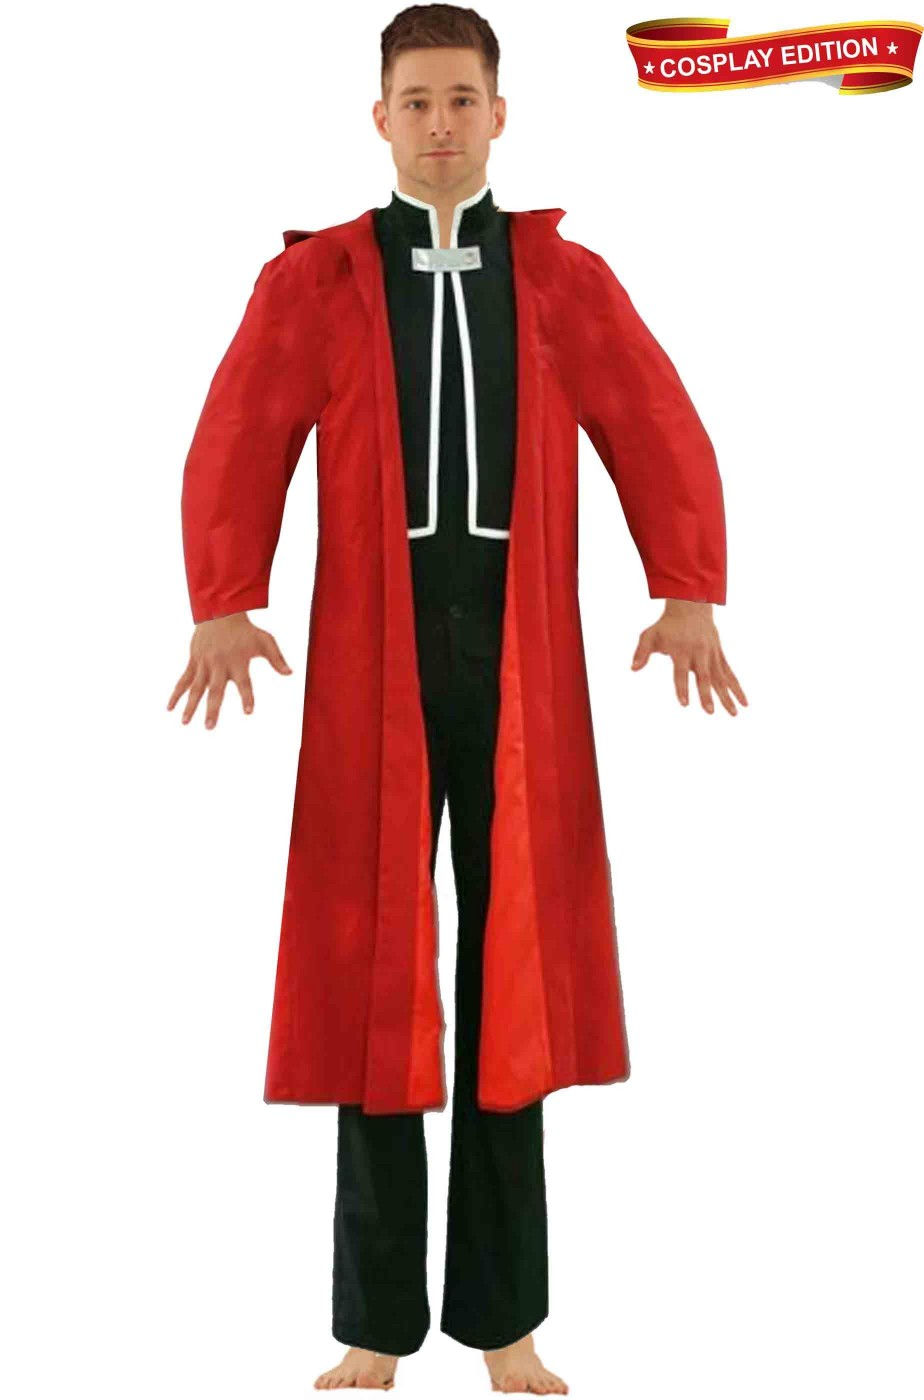 Full Metal Alchemist Edward Elric Costume Cosplay